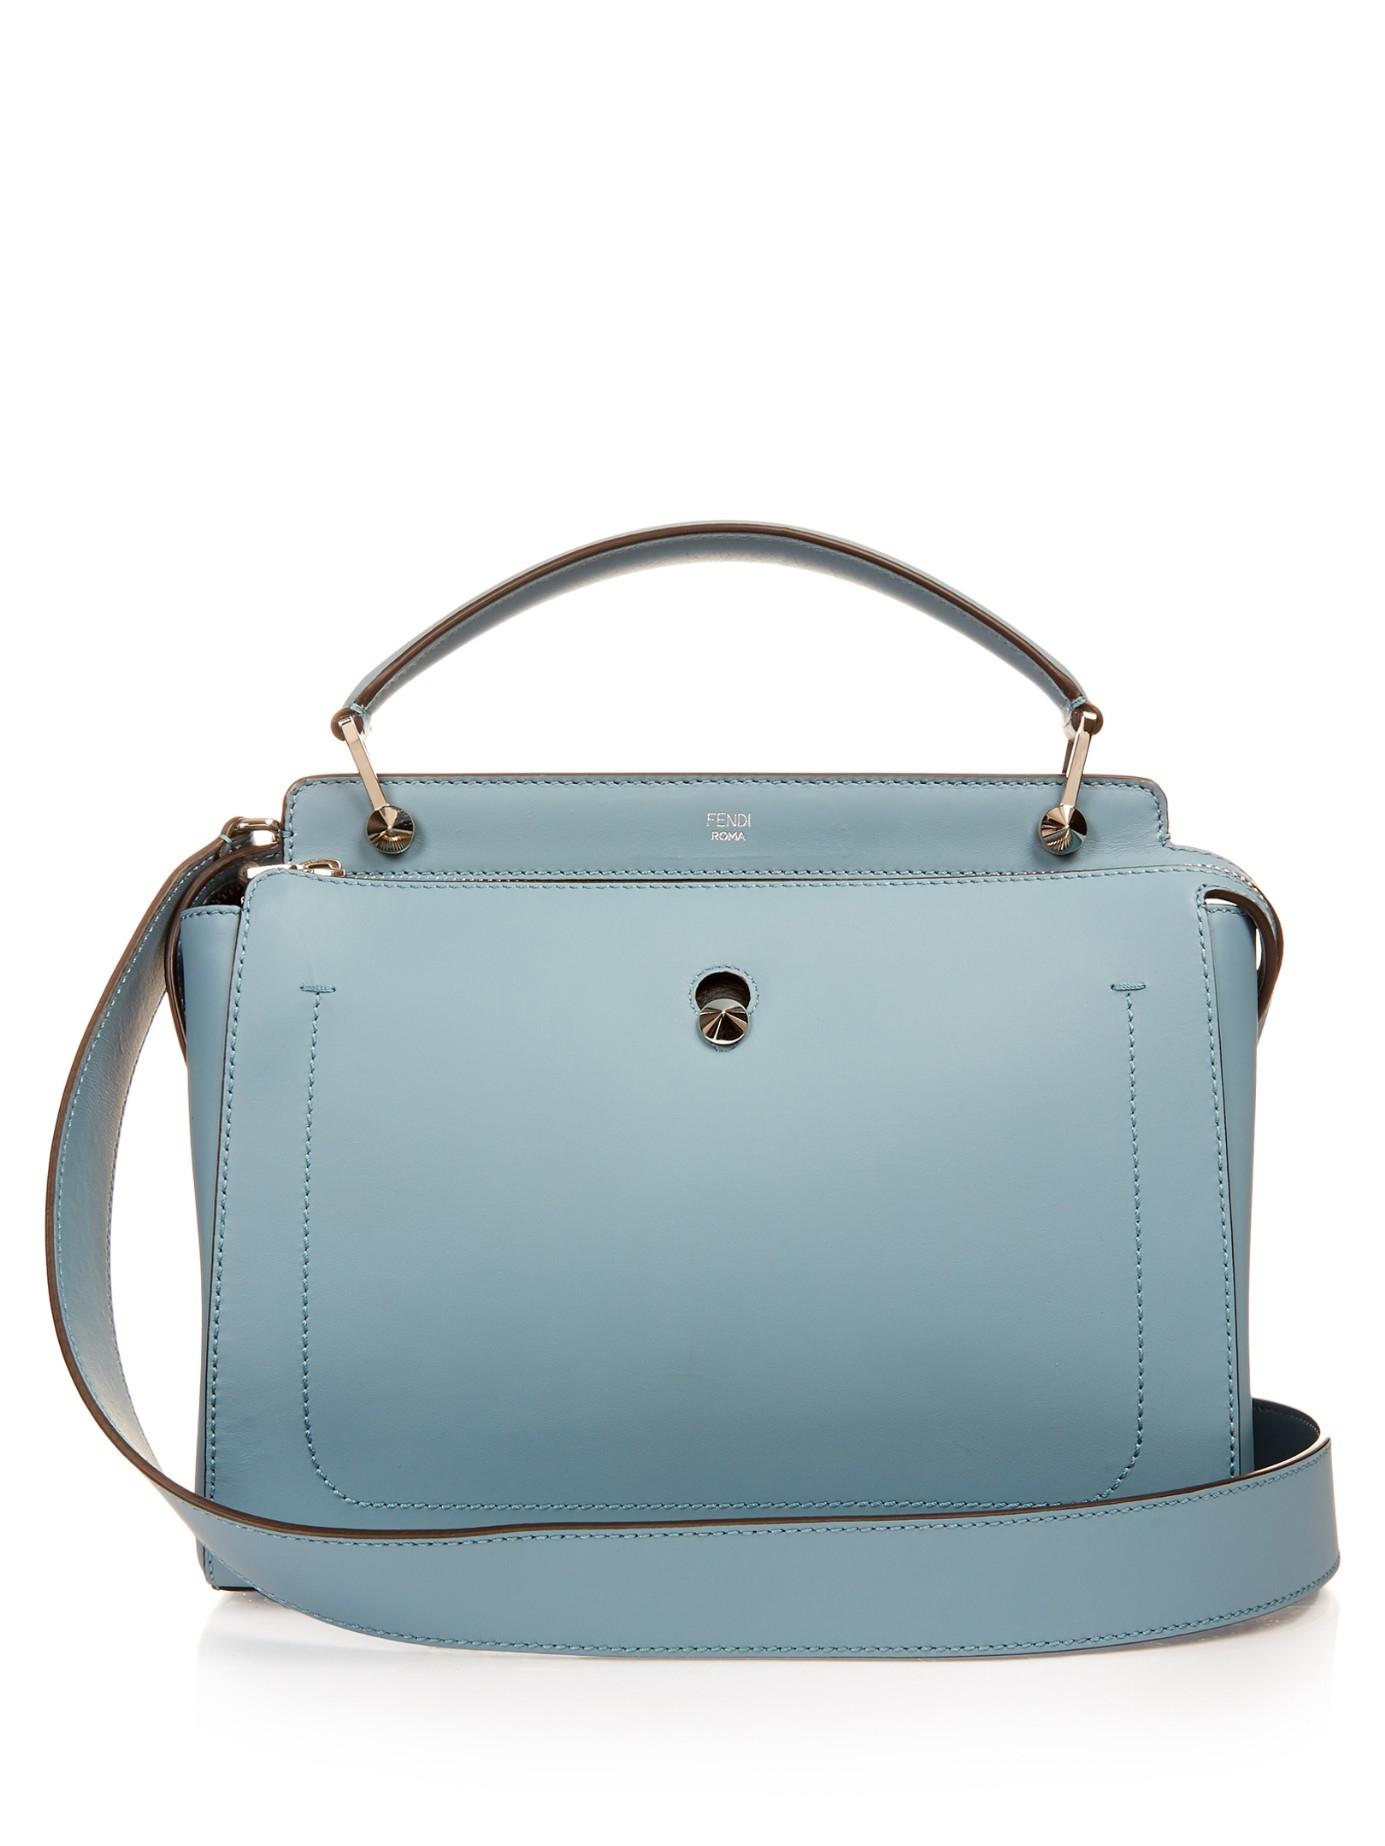 5ddaef5458 ... handbags f8ef4 ed20a canada fendi dot com shoulder bag 7d1e2 84a2c  where to buy lyst fendi dotcom leather bag in blue 9bd12 3dcc3 ...